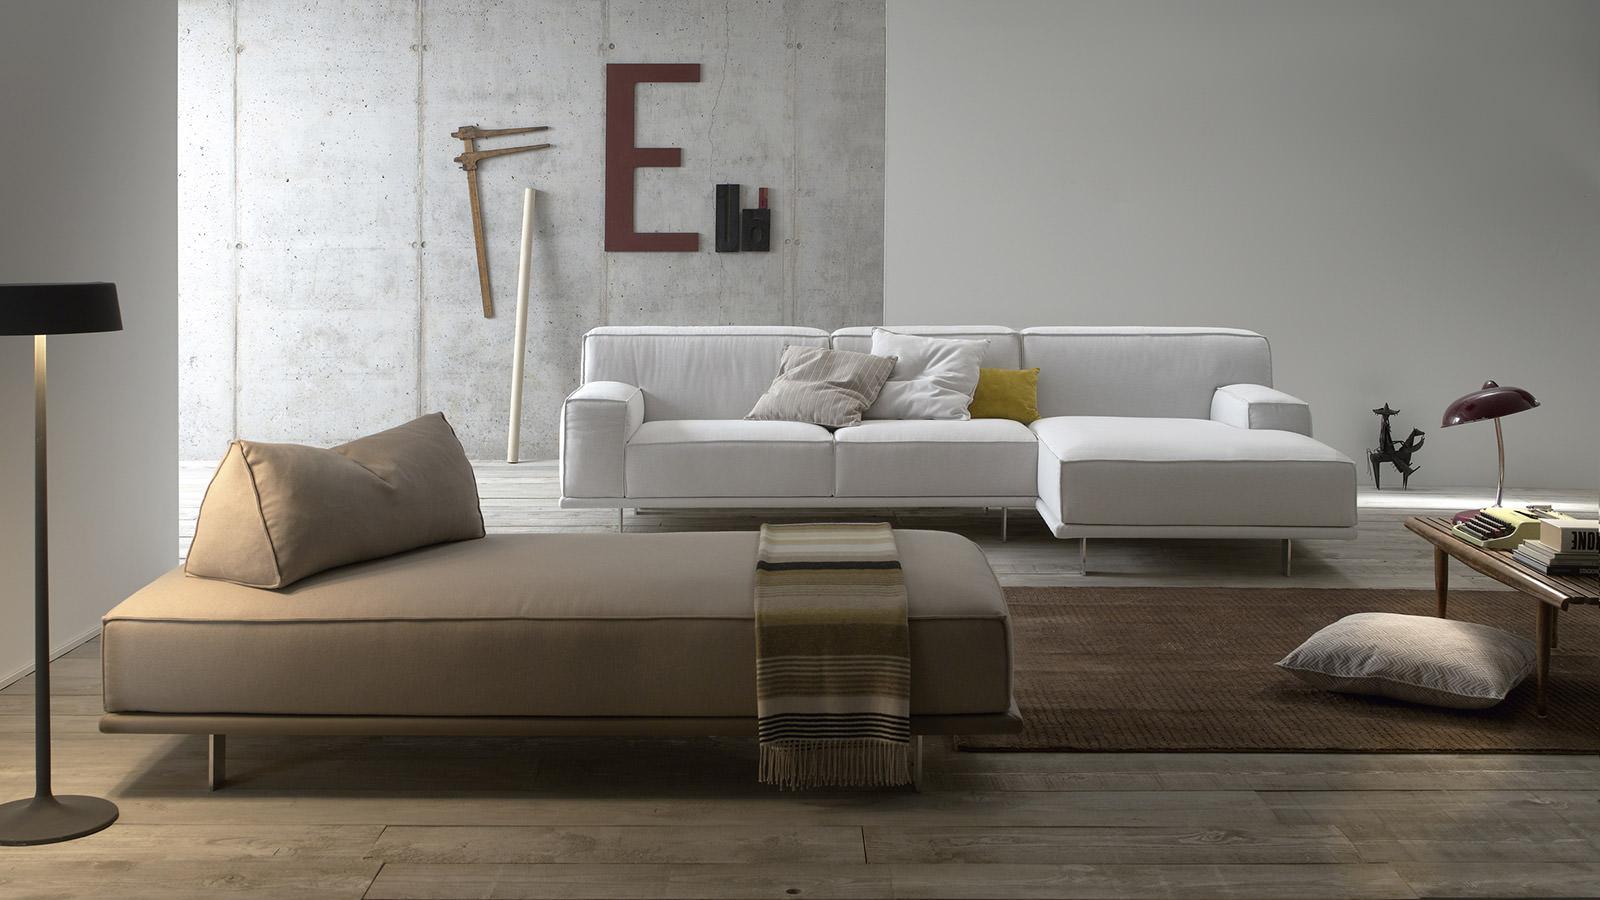 young divani moderni e di design felis